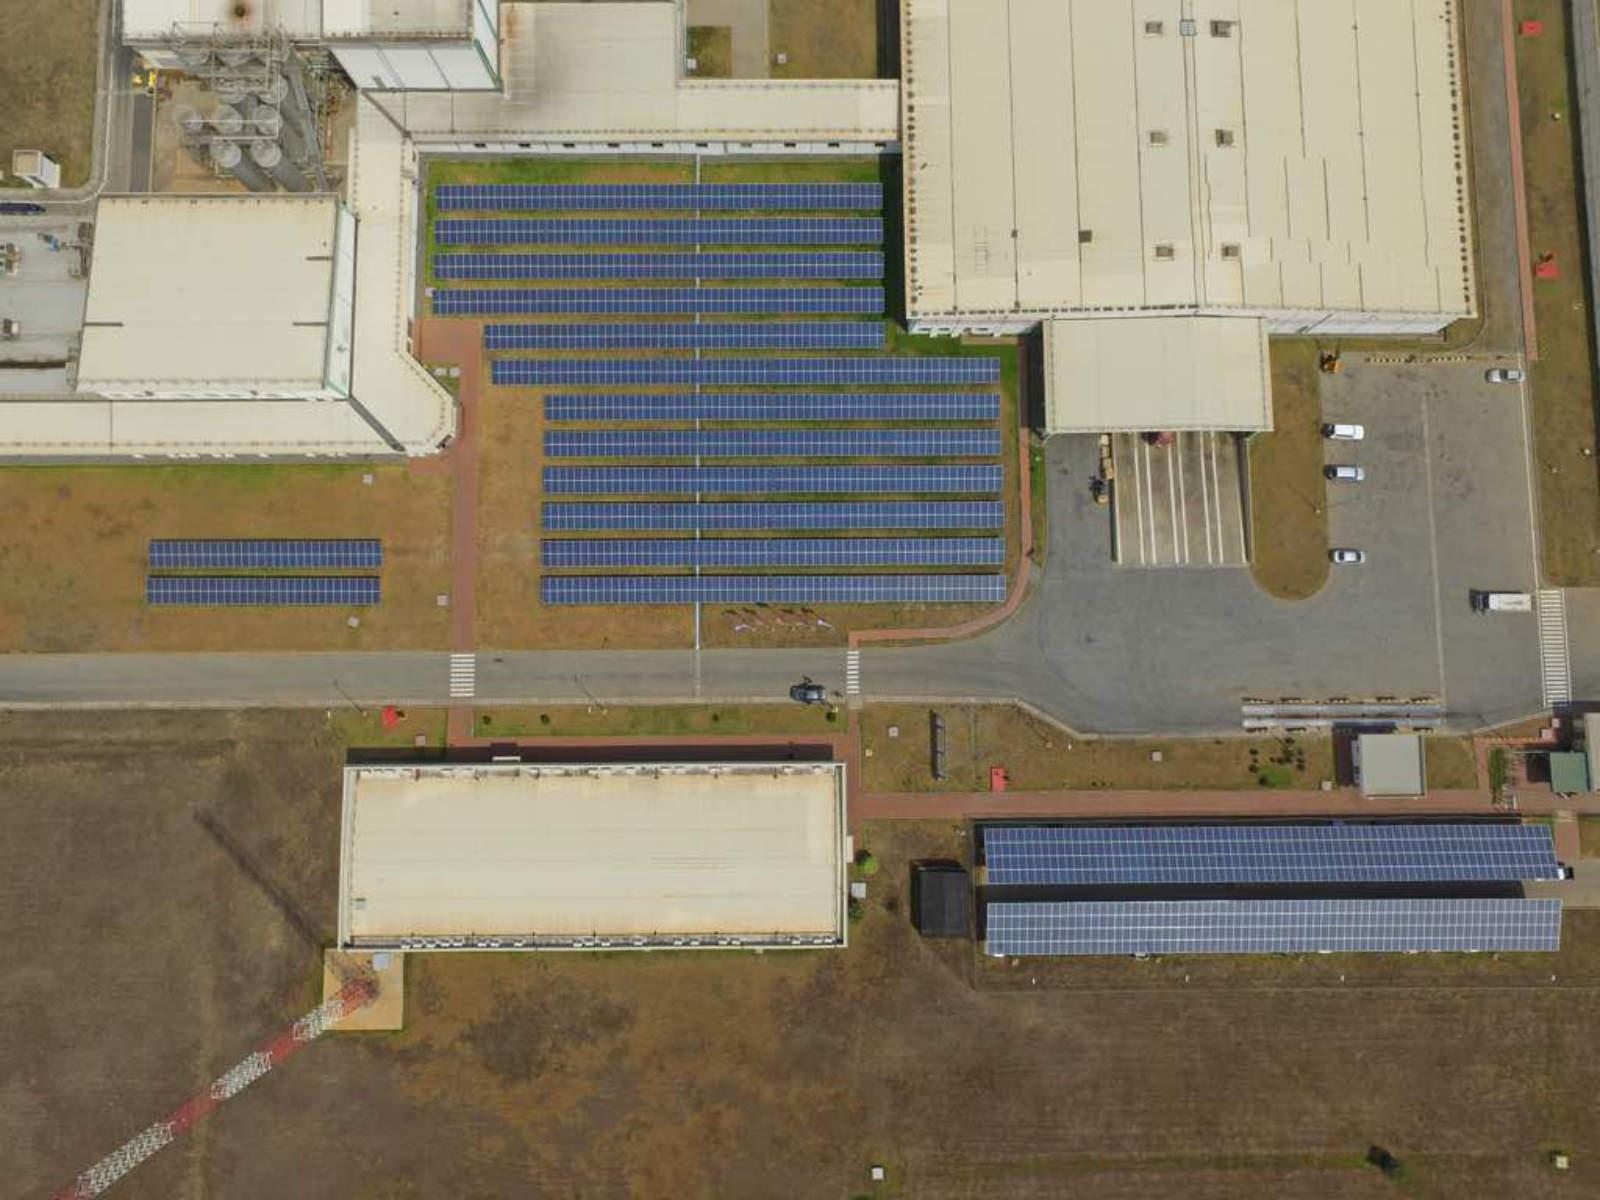 Estructuras fotovoltaicas de suelo